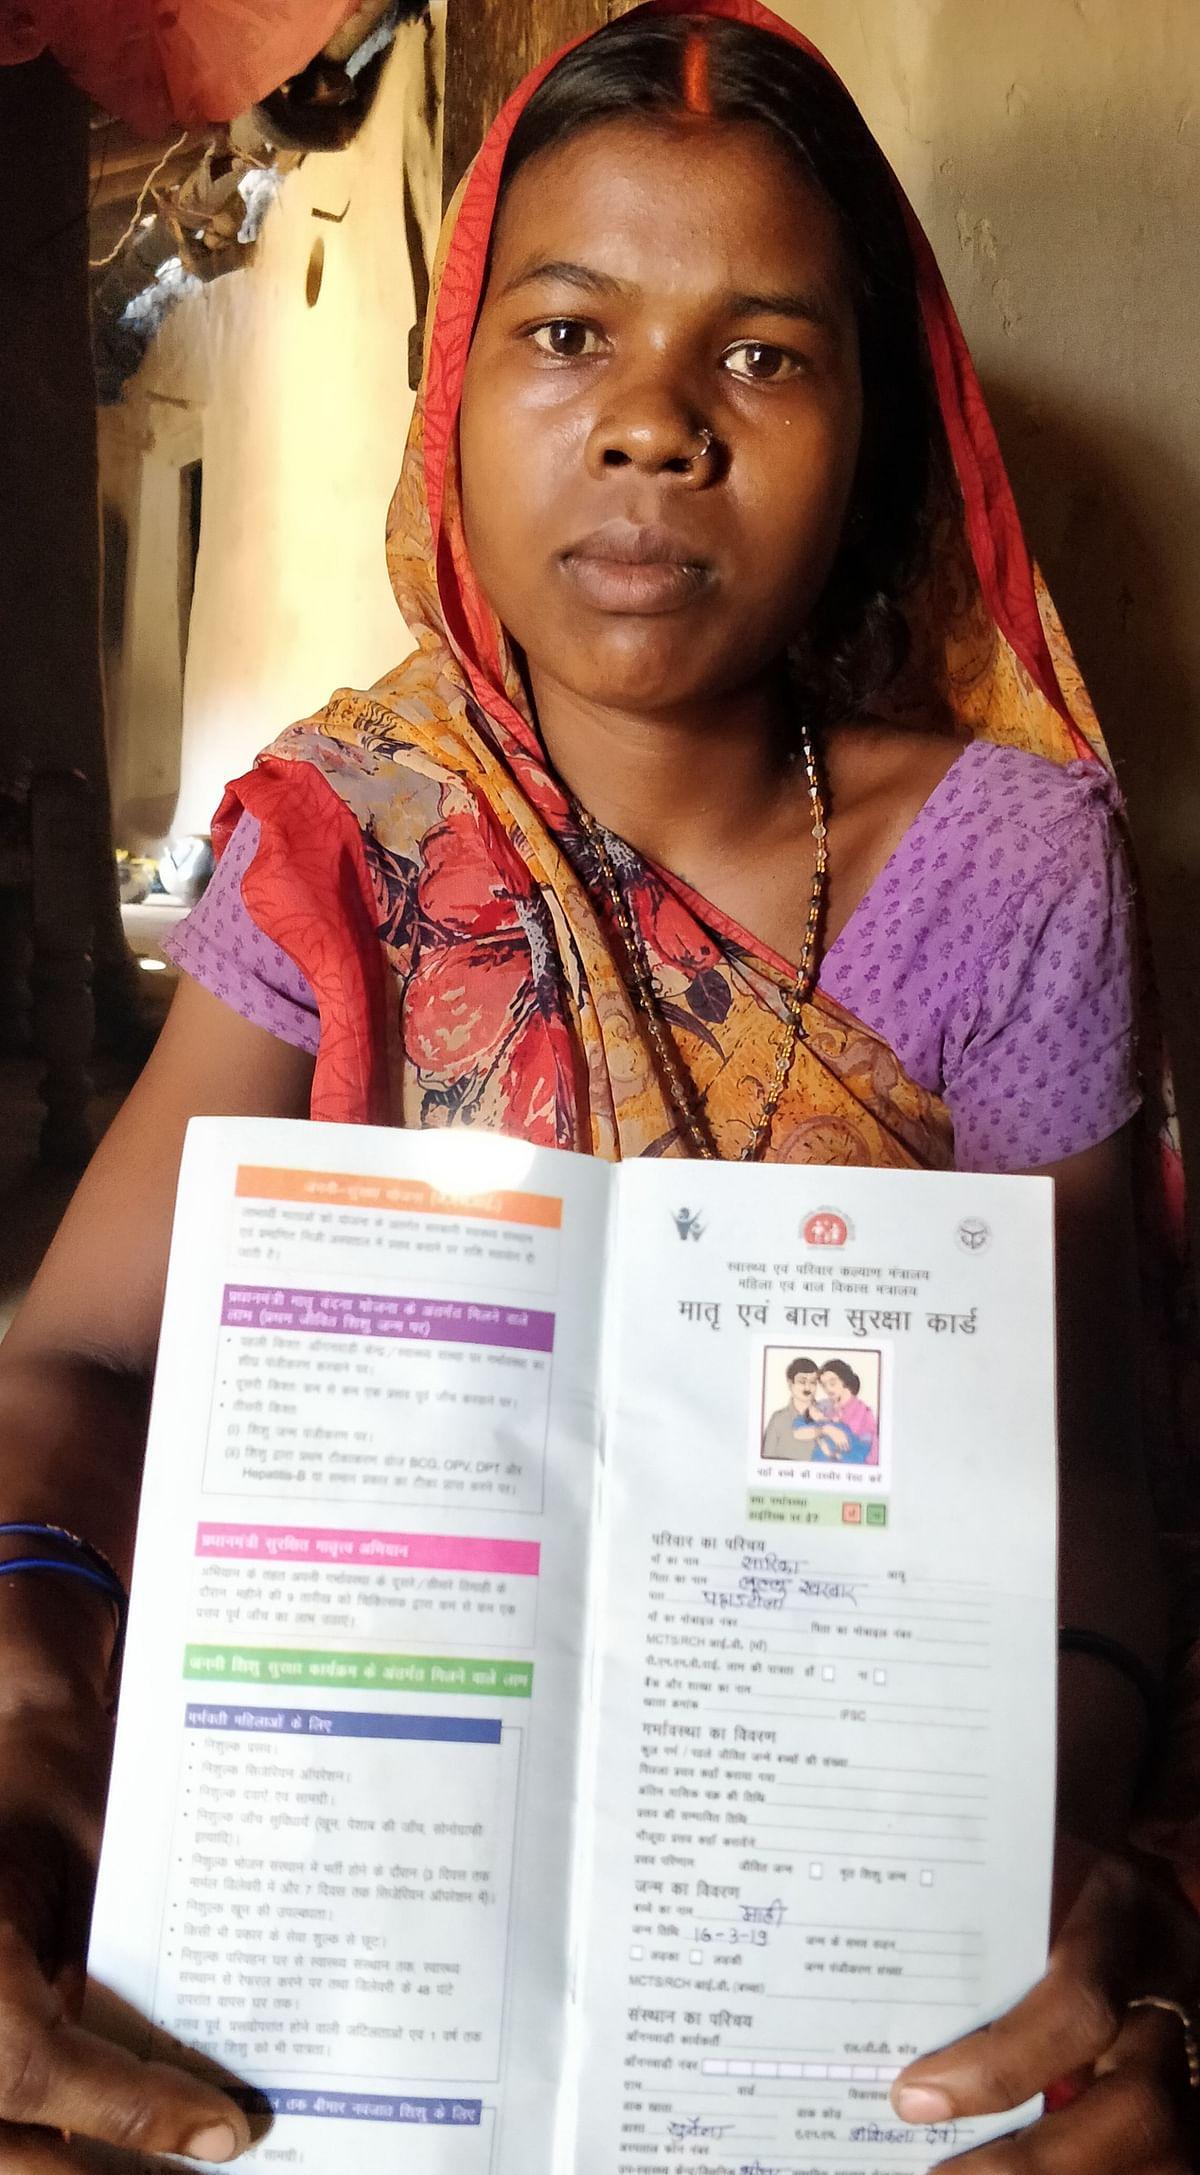 Sarita Devi, from eastern UP, had to deliver her child on hospital veranda yet was denied benefit under the Janani Suraksha Scheme.